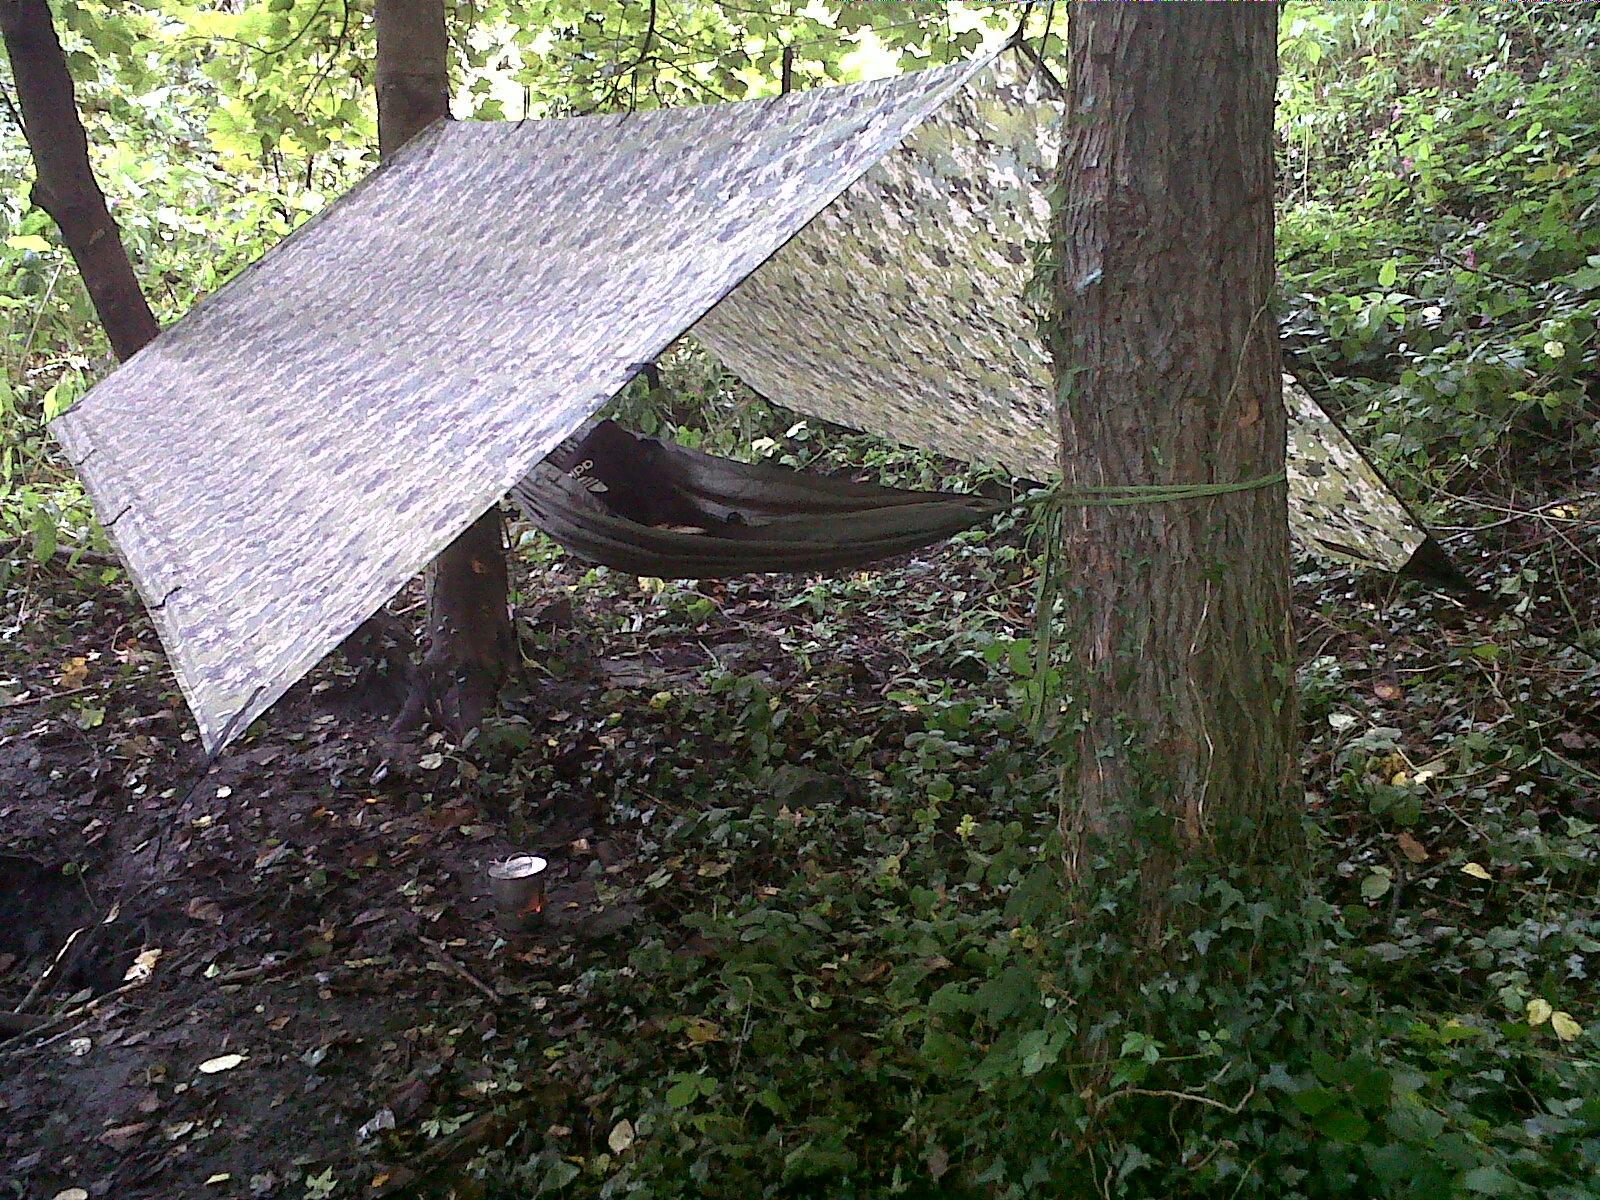 The Outdoorist Hammock set up